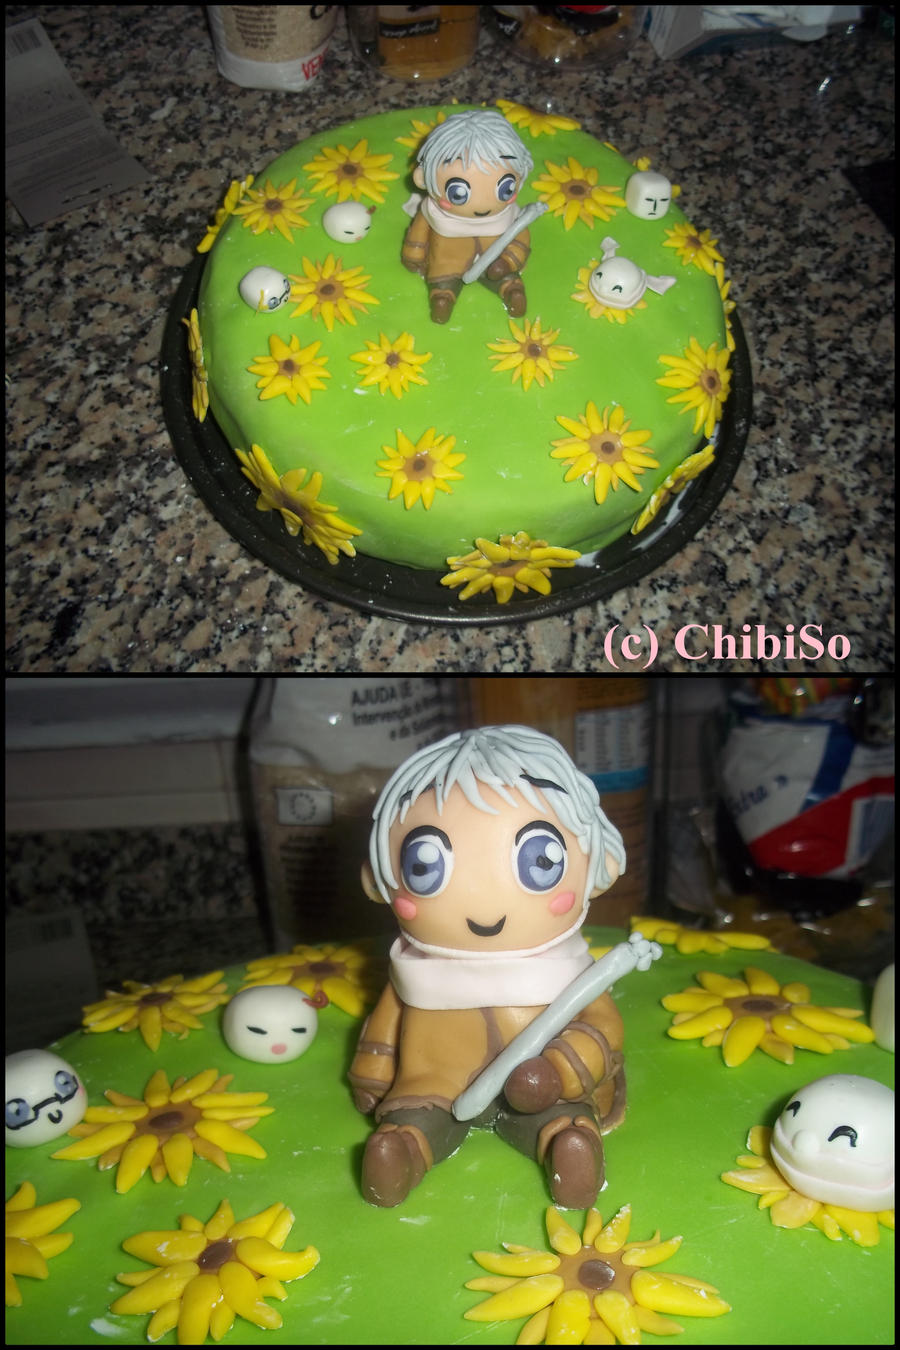 hetalia cake by ChibiSo